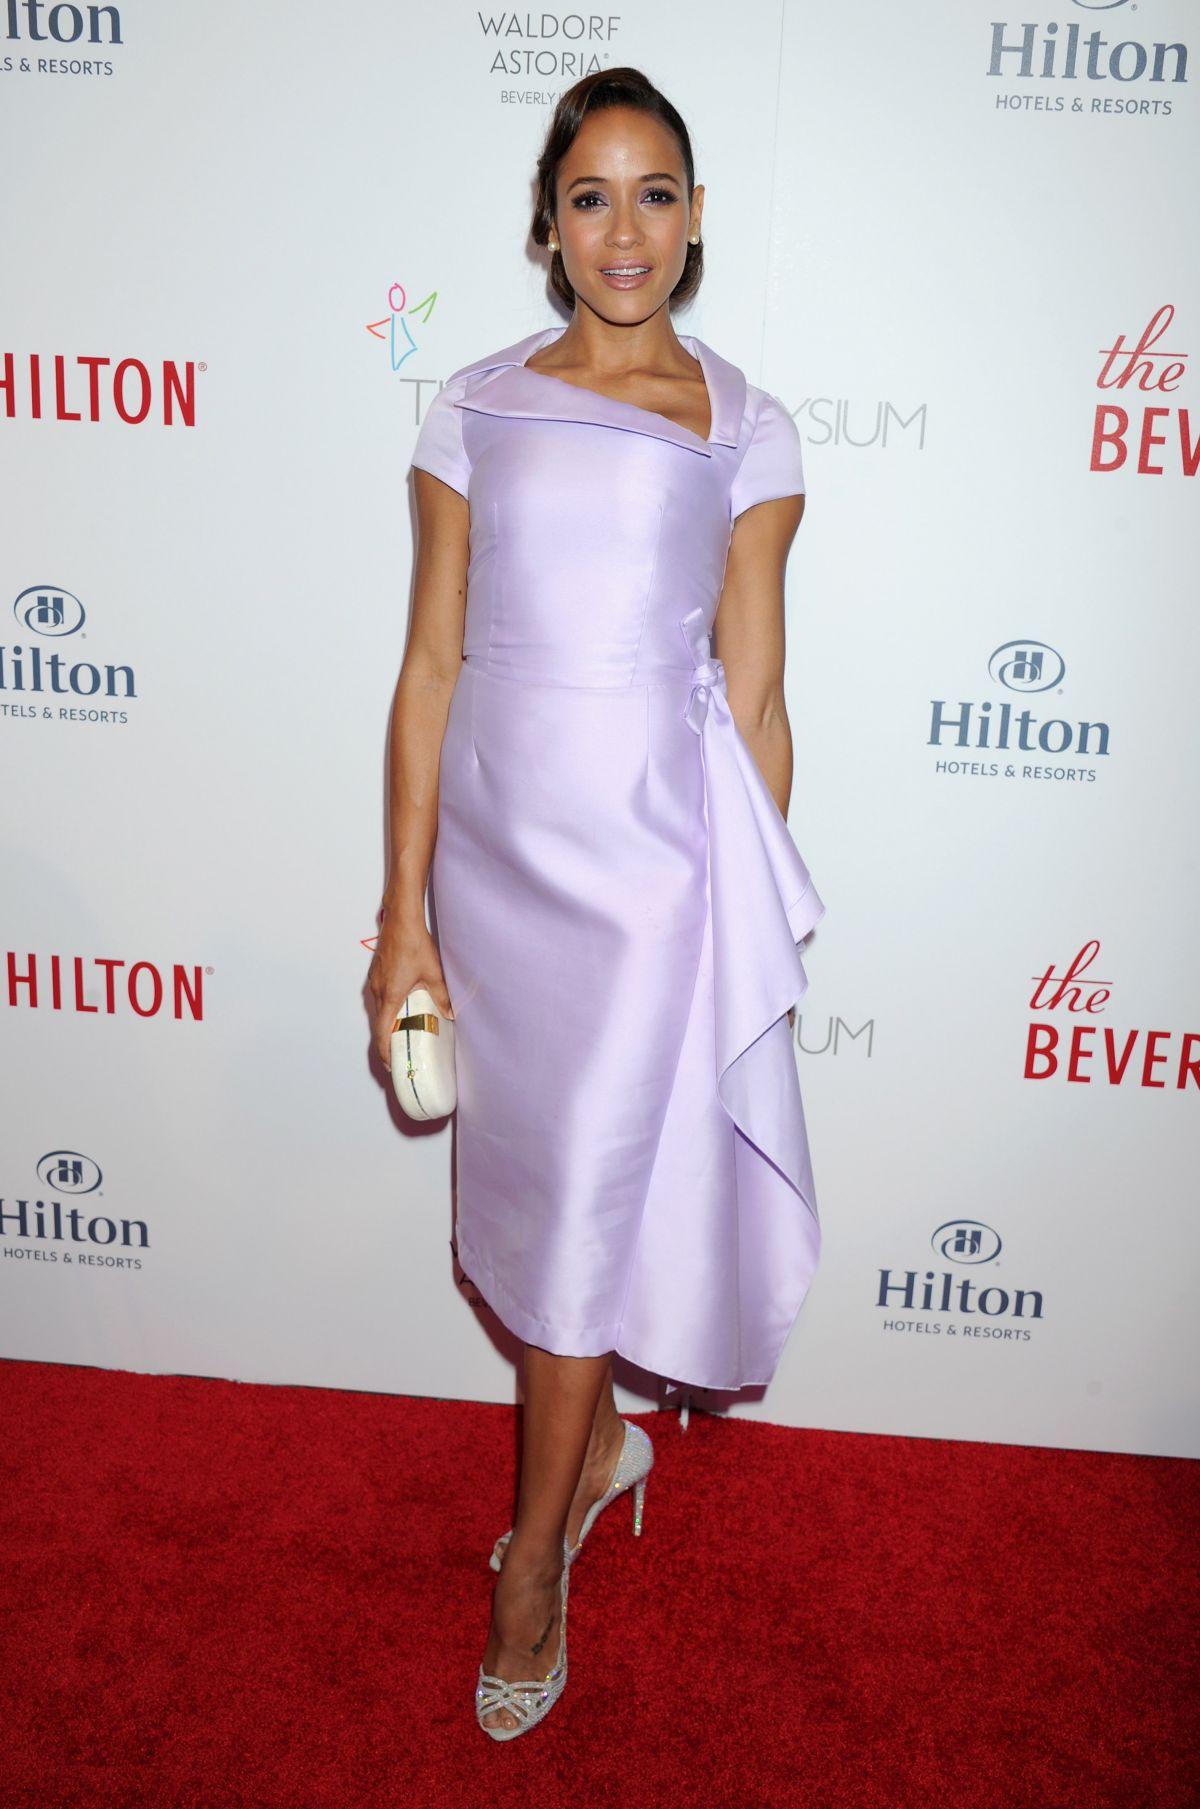 DANIA RAMIREZ at Beverly Hilton 60 Years Diamond Anniversary Party